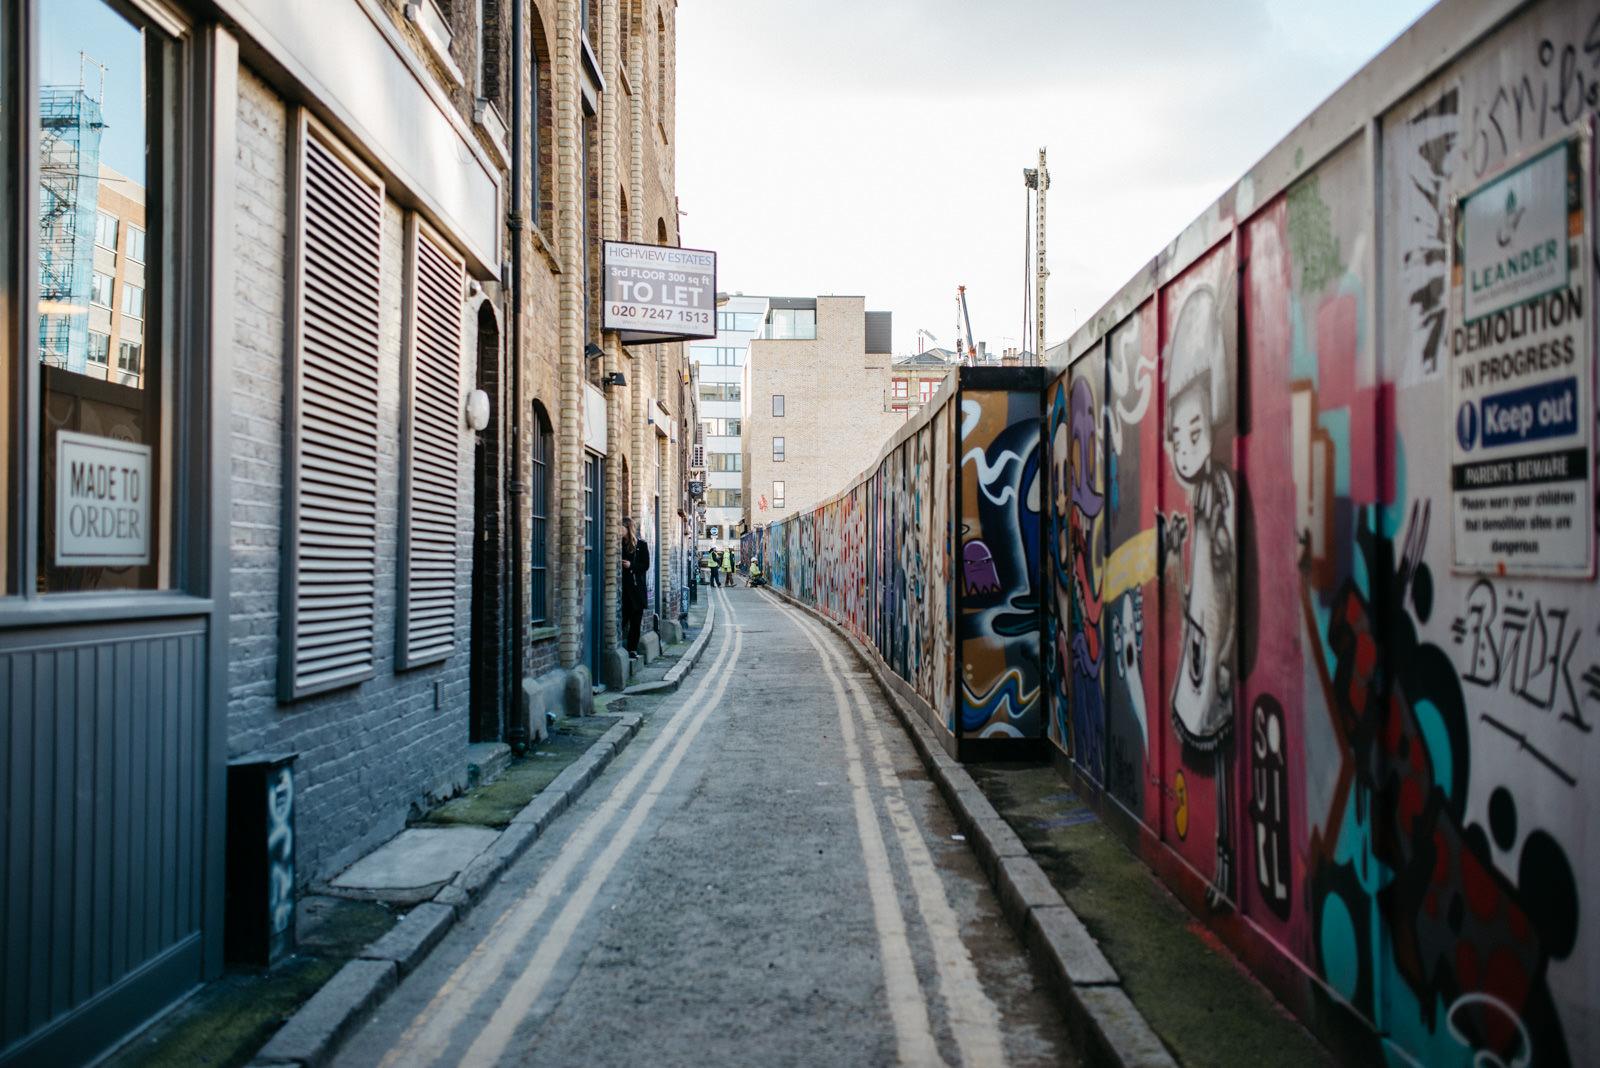 Shoreditch backstreets full of graffiti and texture